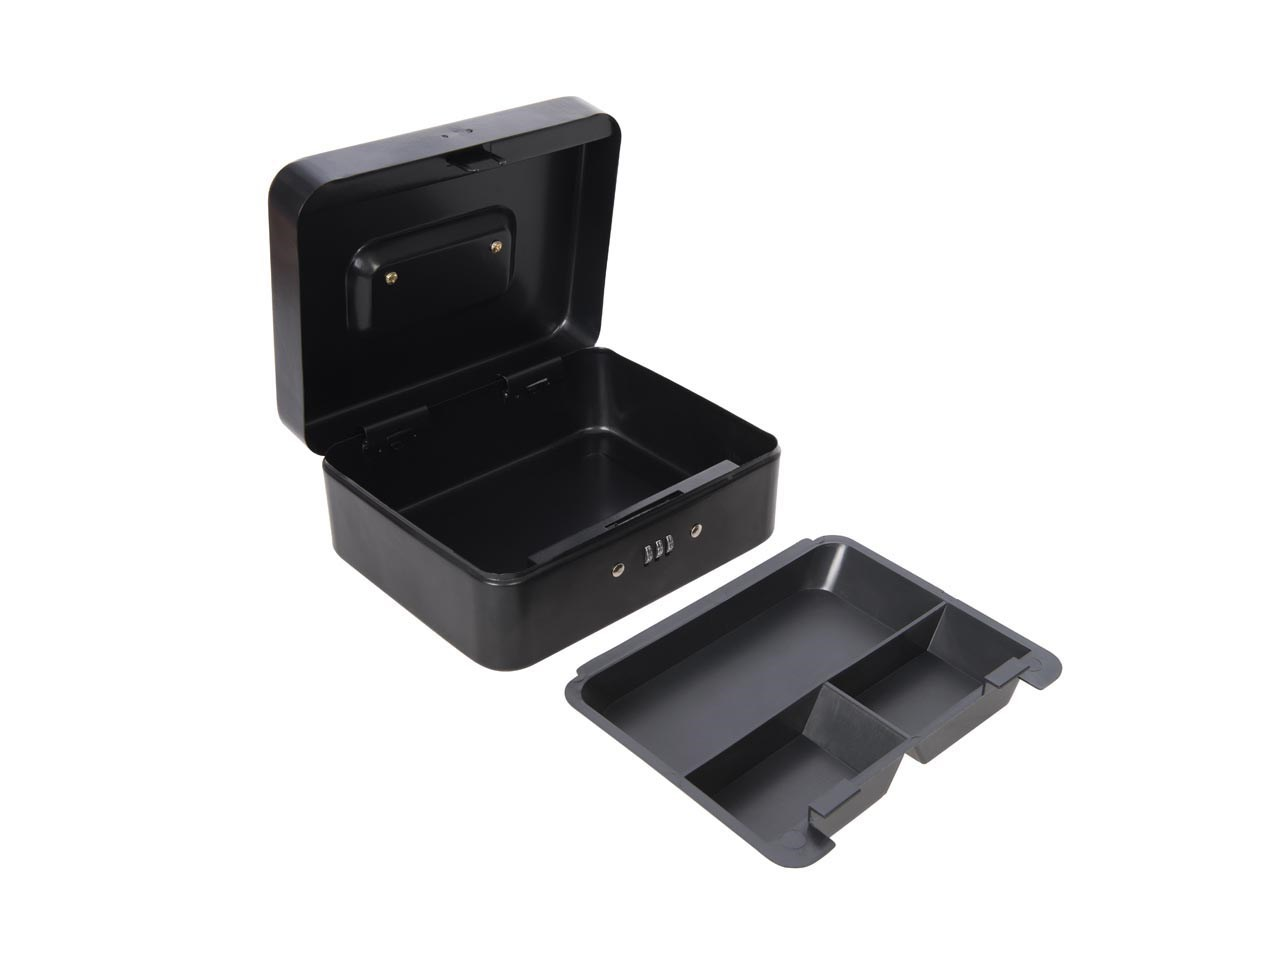 Silverline 732370 3-Digit Combination Cash and Valuables Safe Box